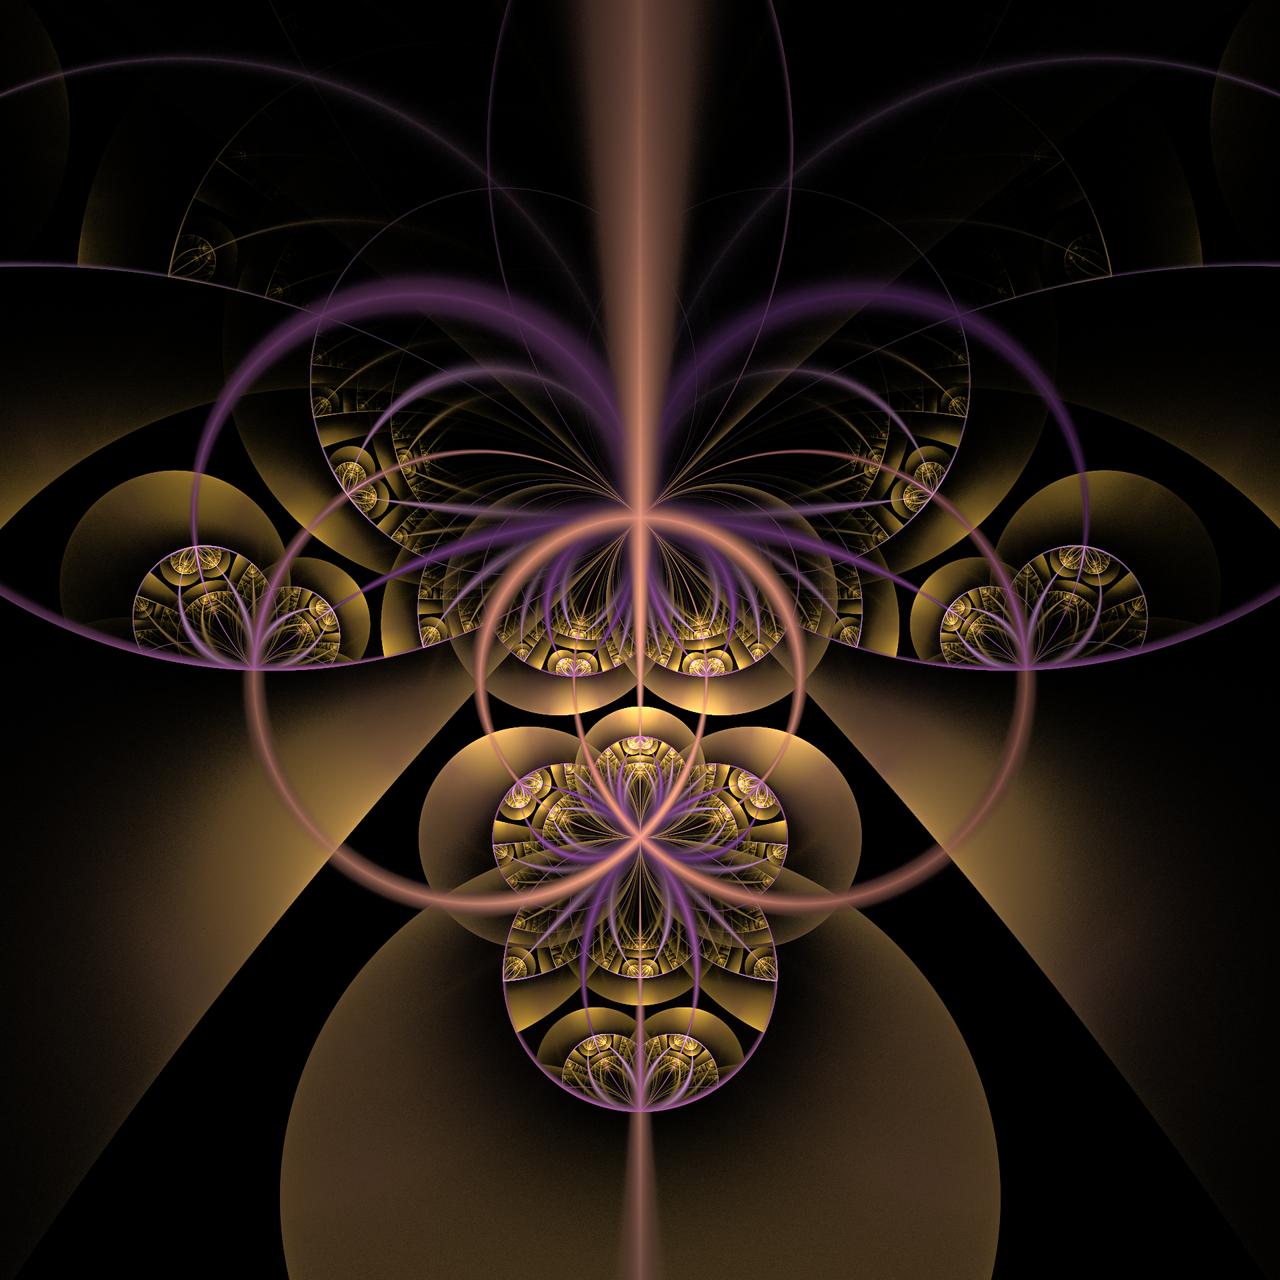 curly splits by Raykoid666